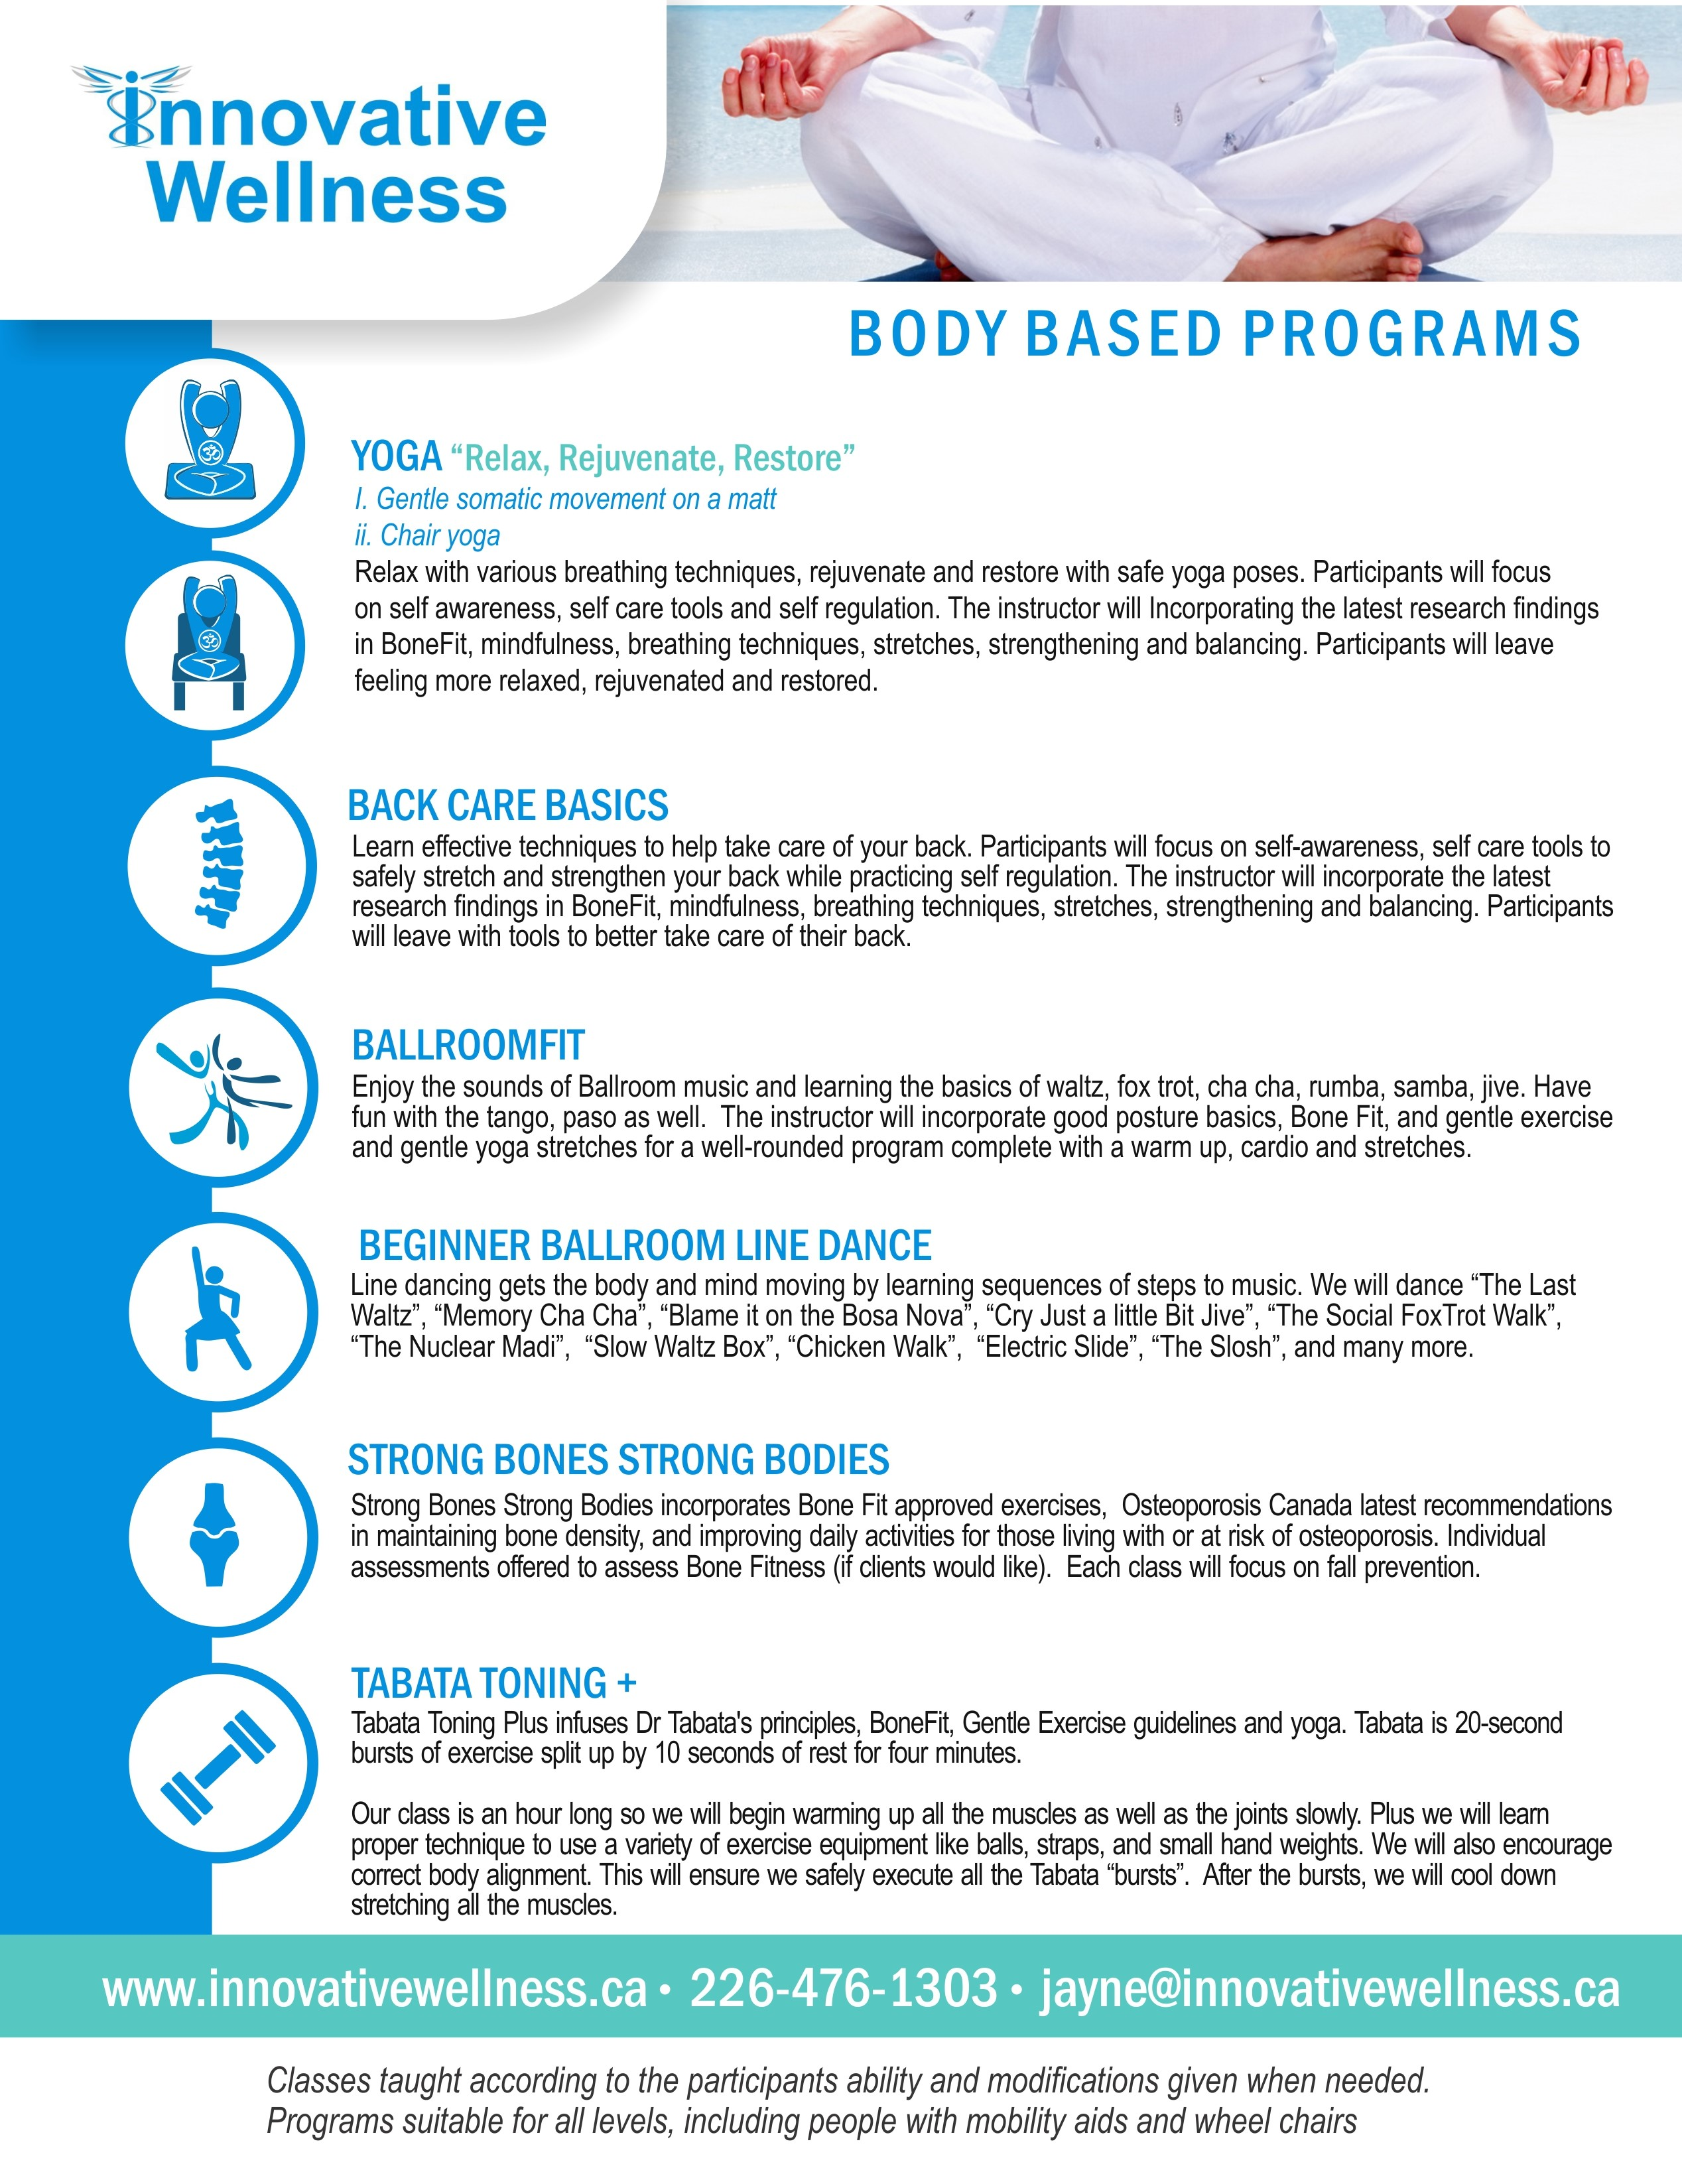 BodyBasedPrograms